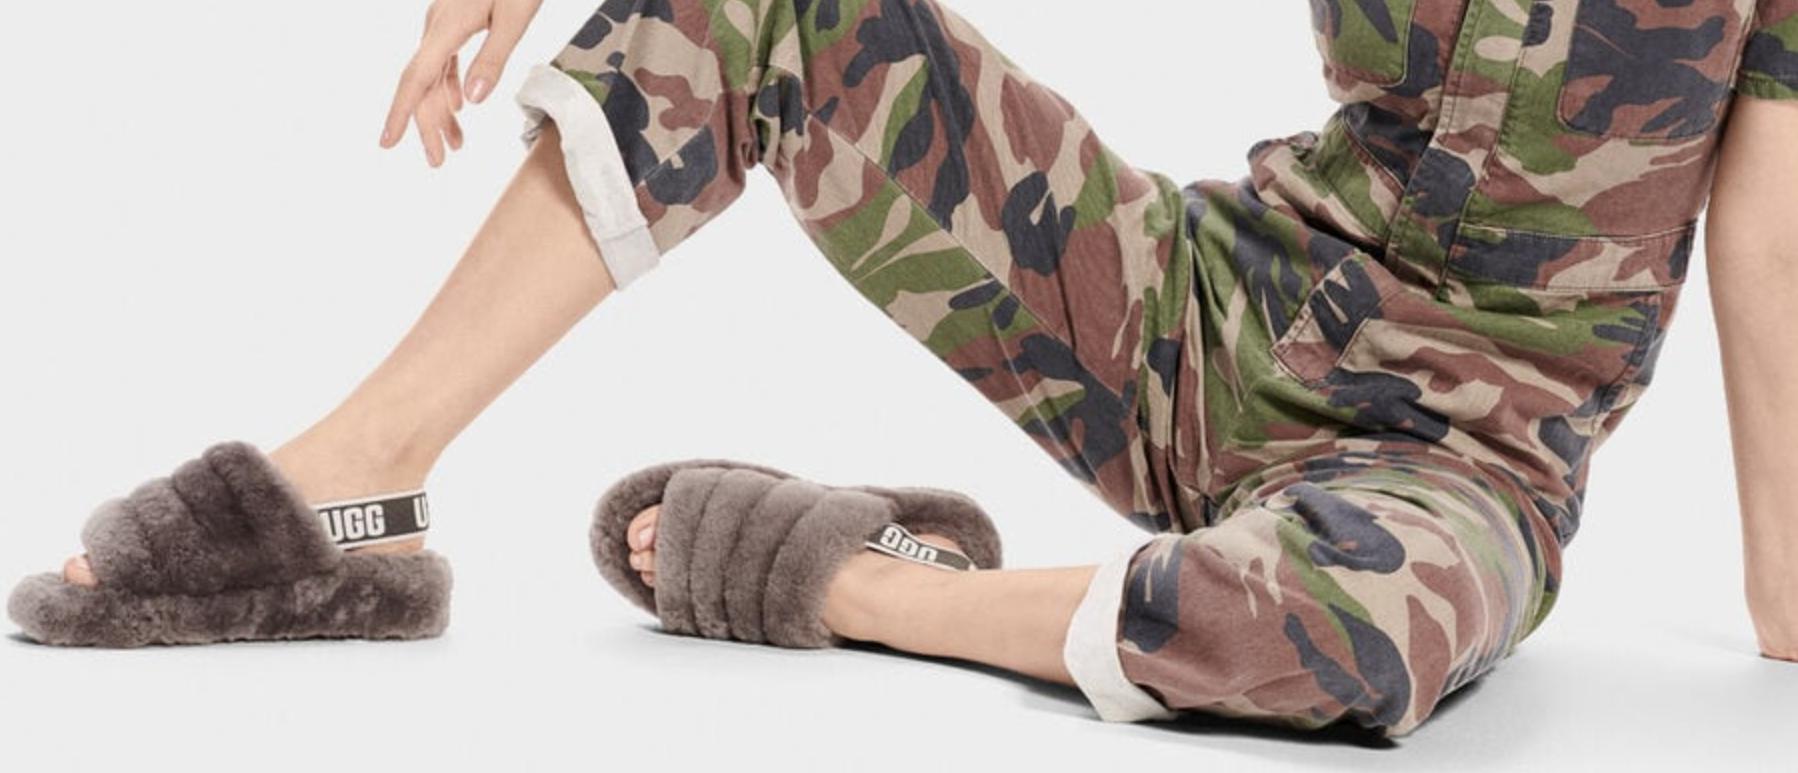 Ugg Fluff Yea Slide Slippers Gray